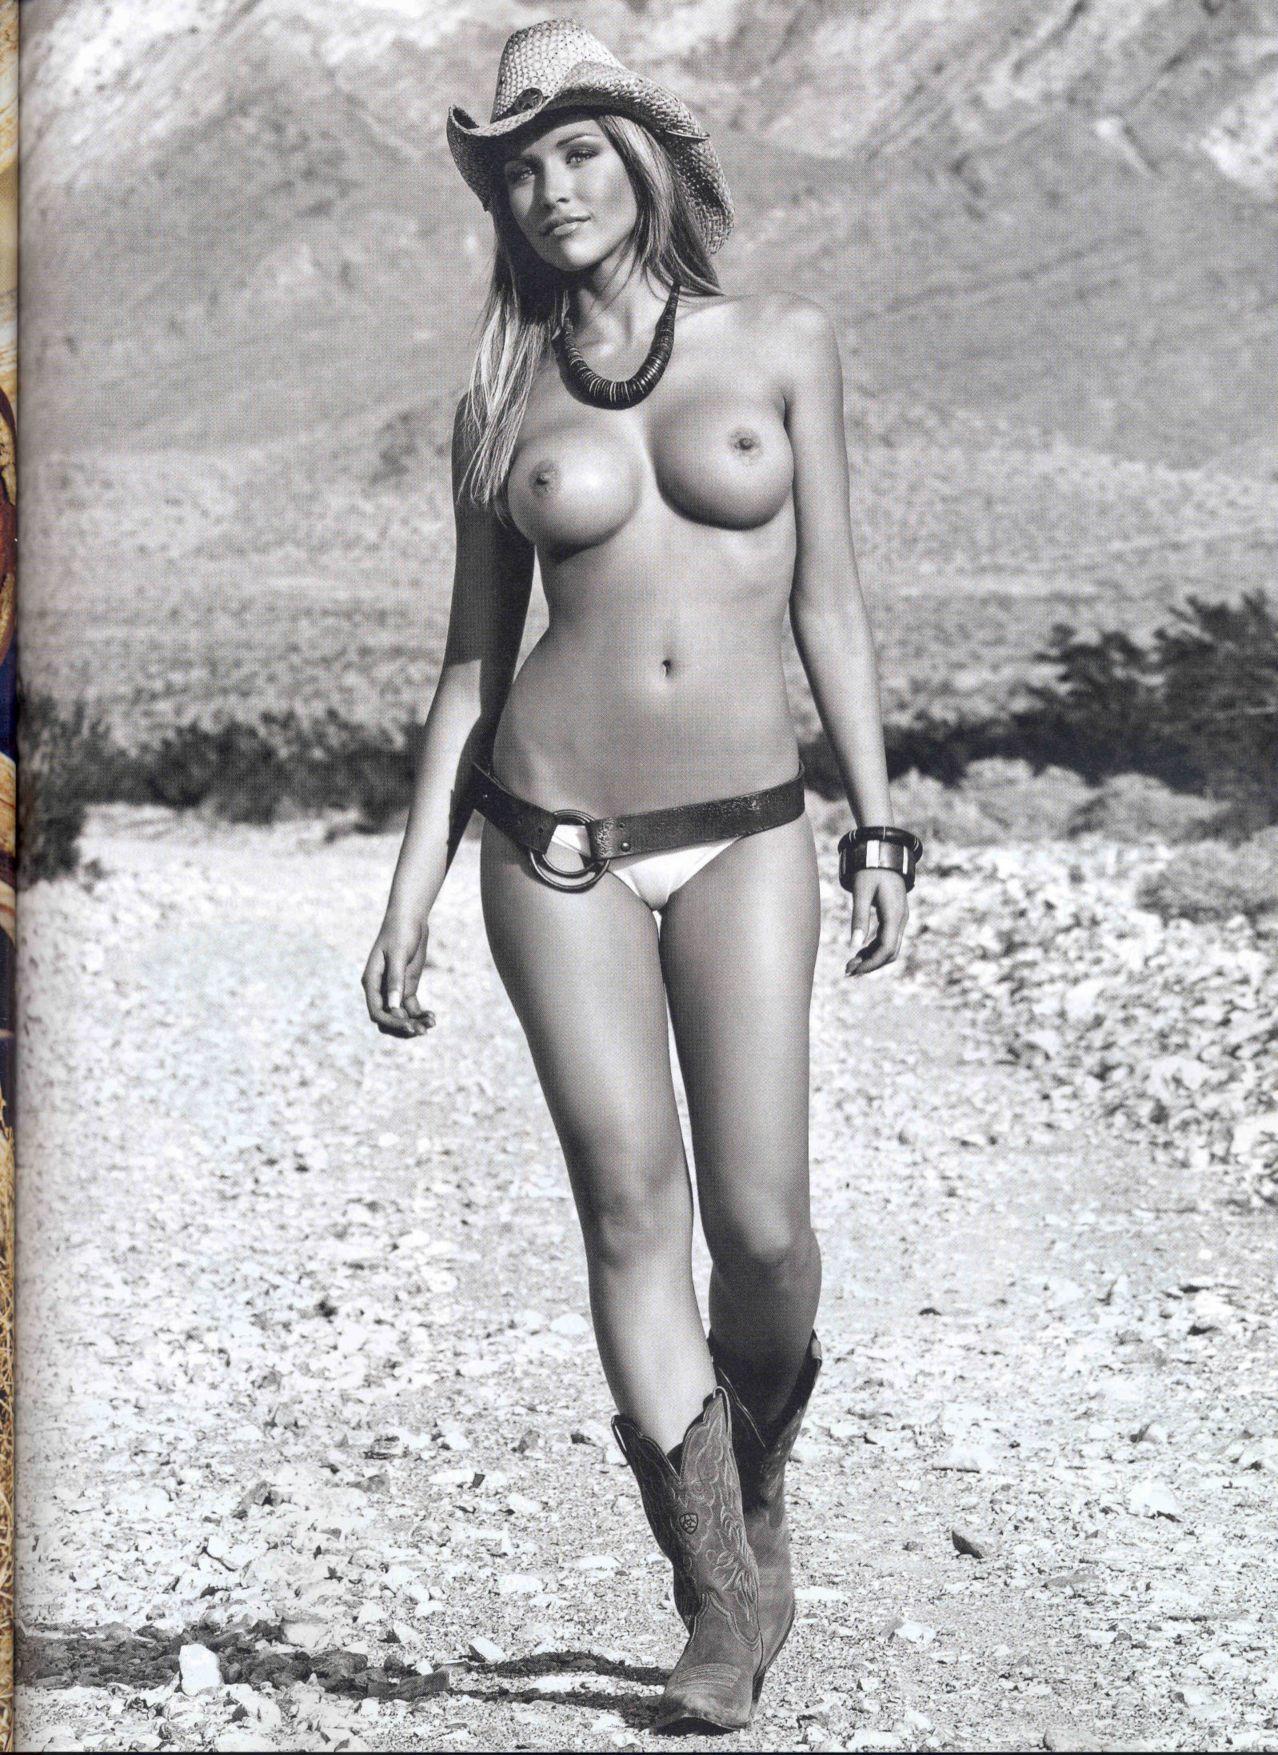 Playboy_4-2007_Slovenia_Scanof.net_045.jpg